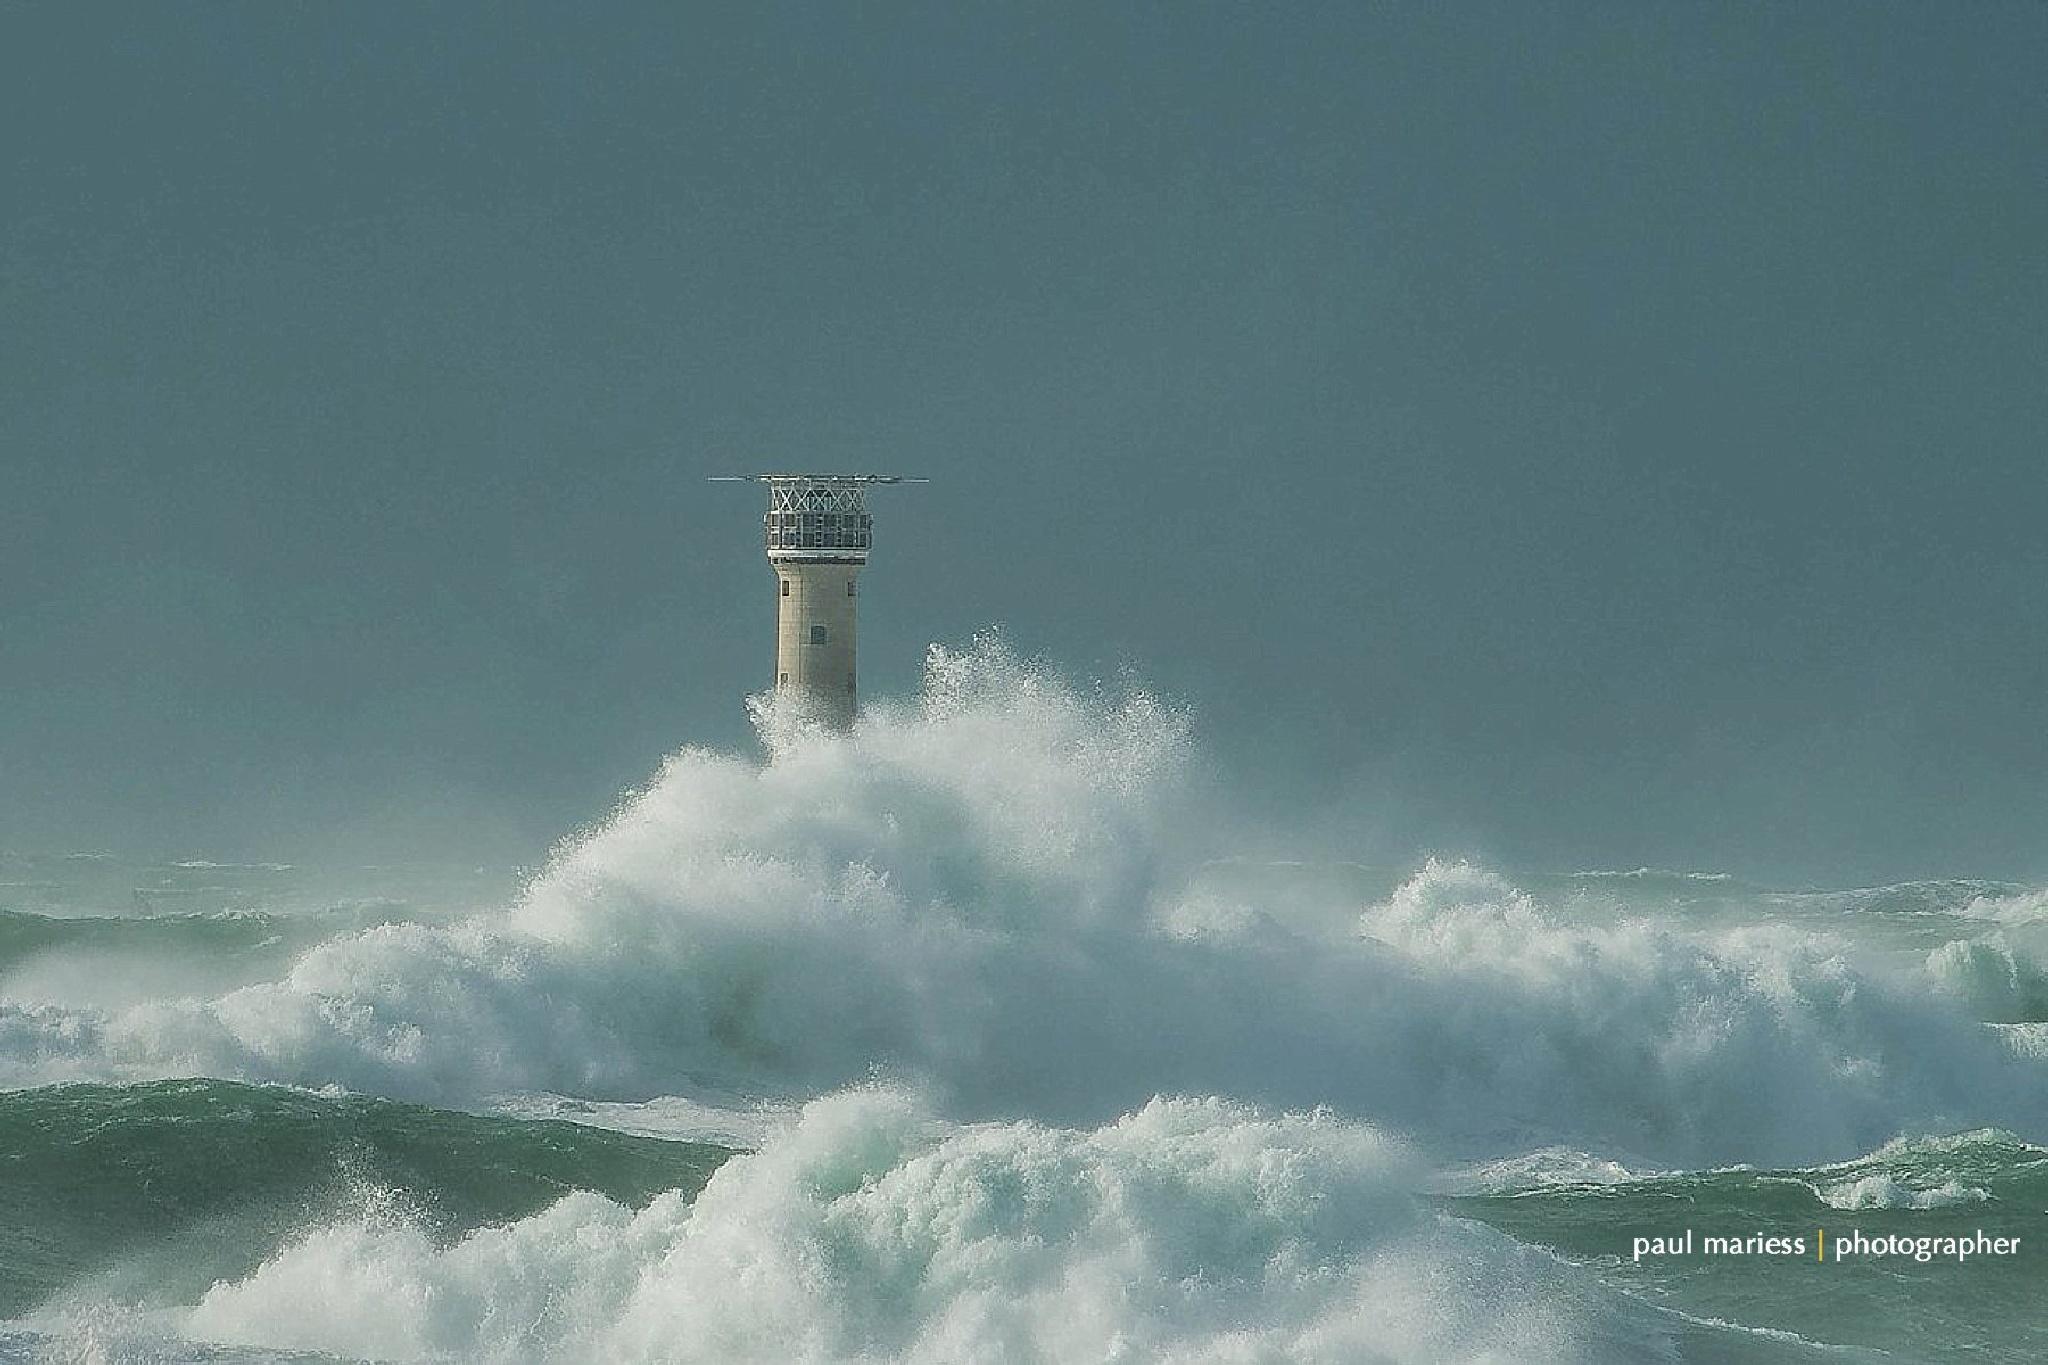 Storm Imogen by paul mariess